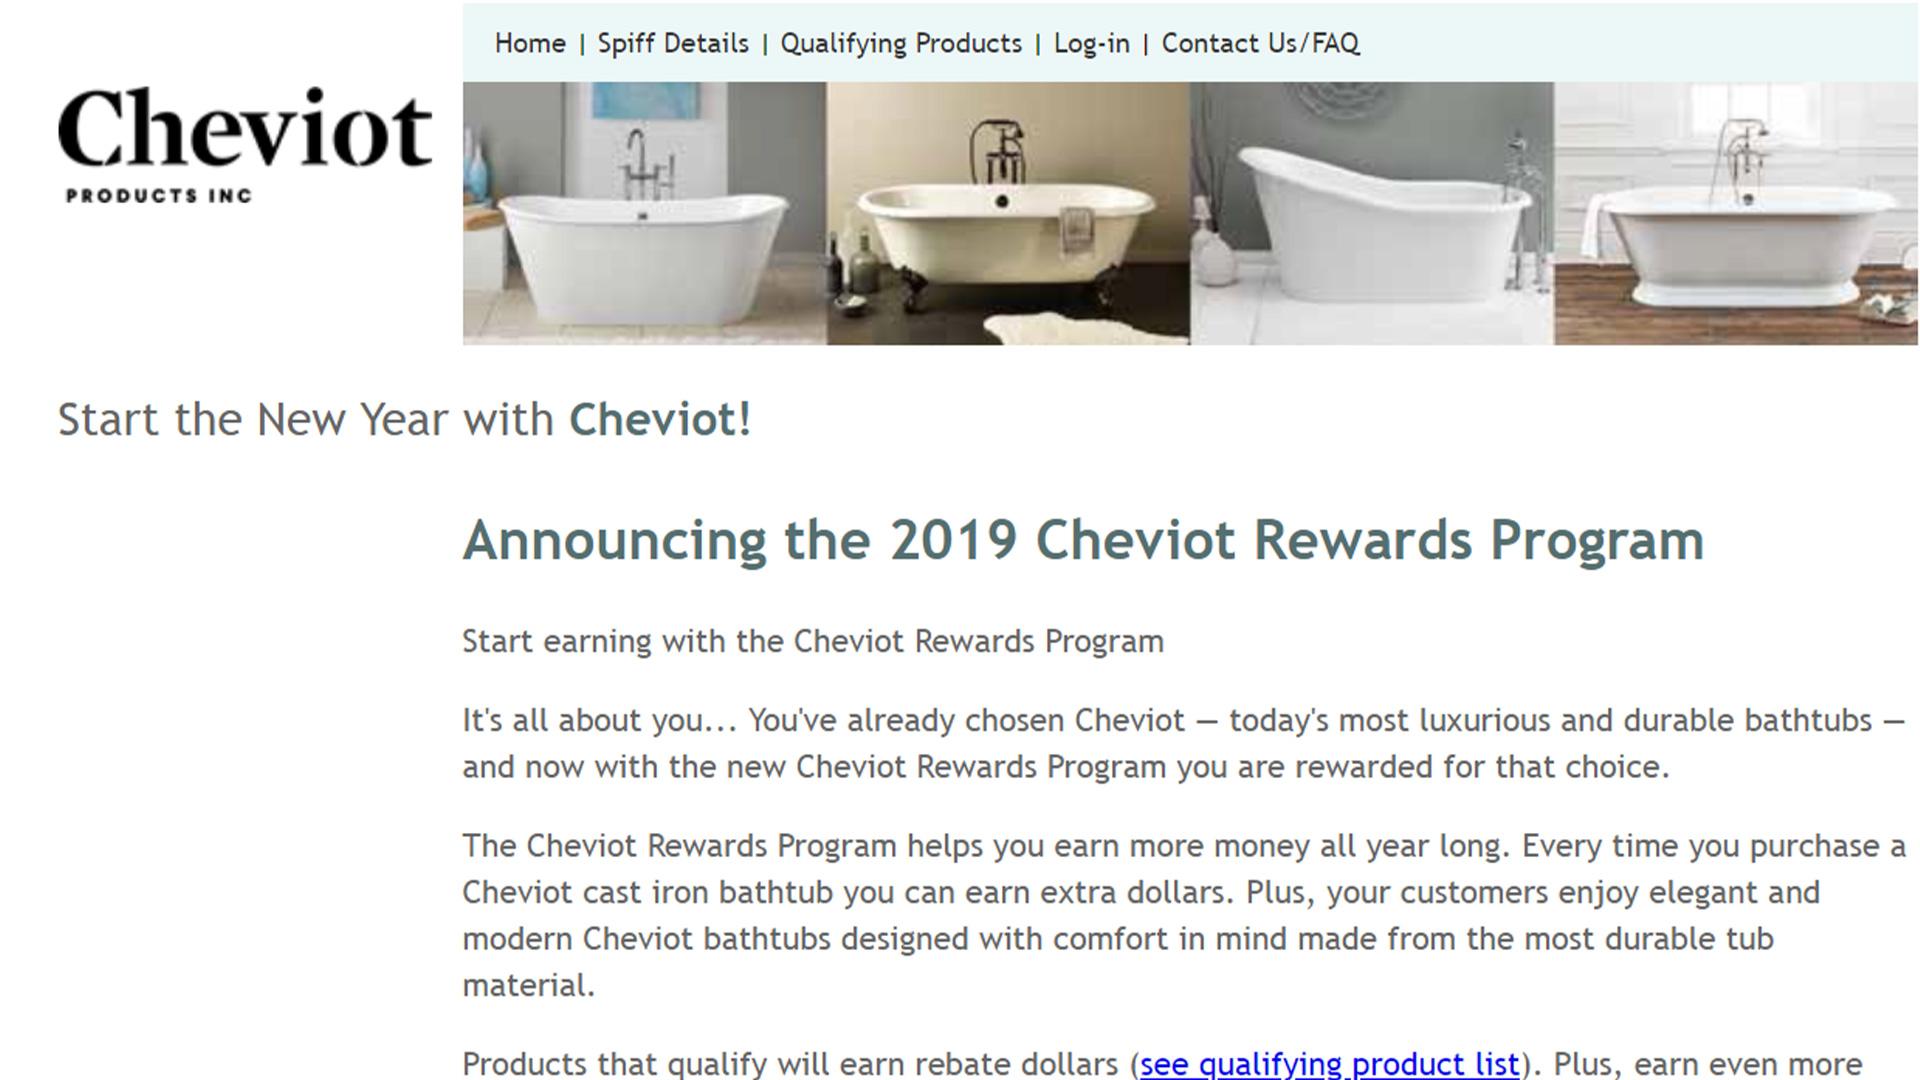 Cheviot Rewards Program